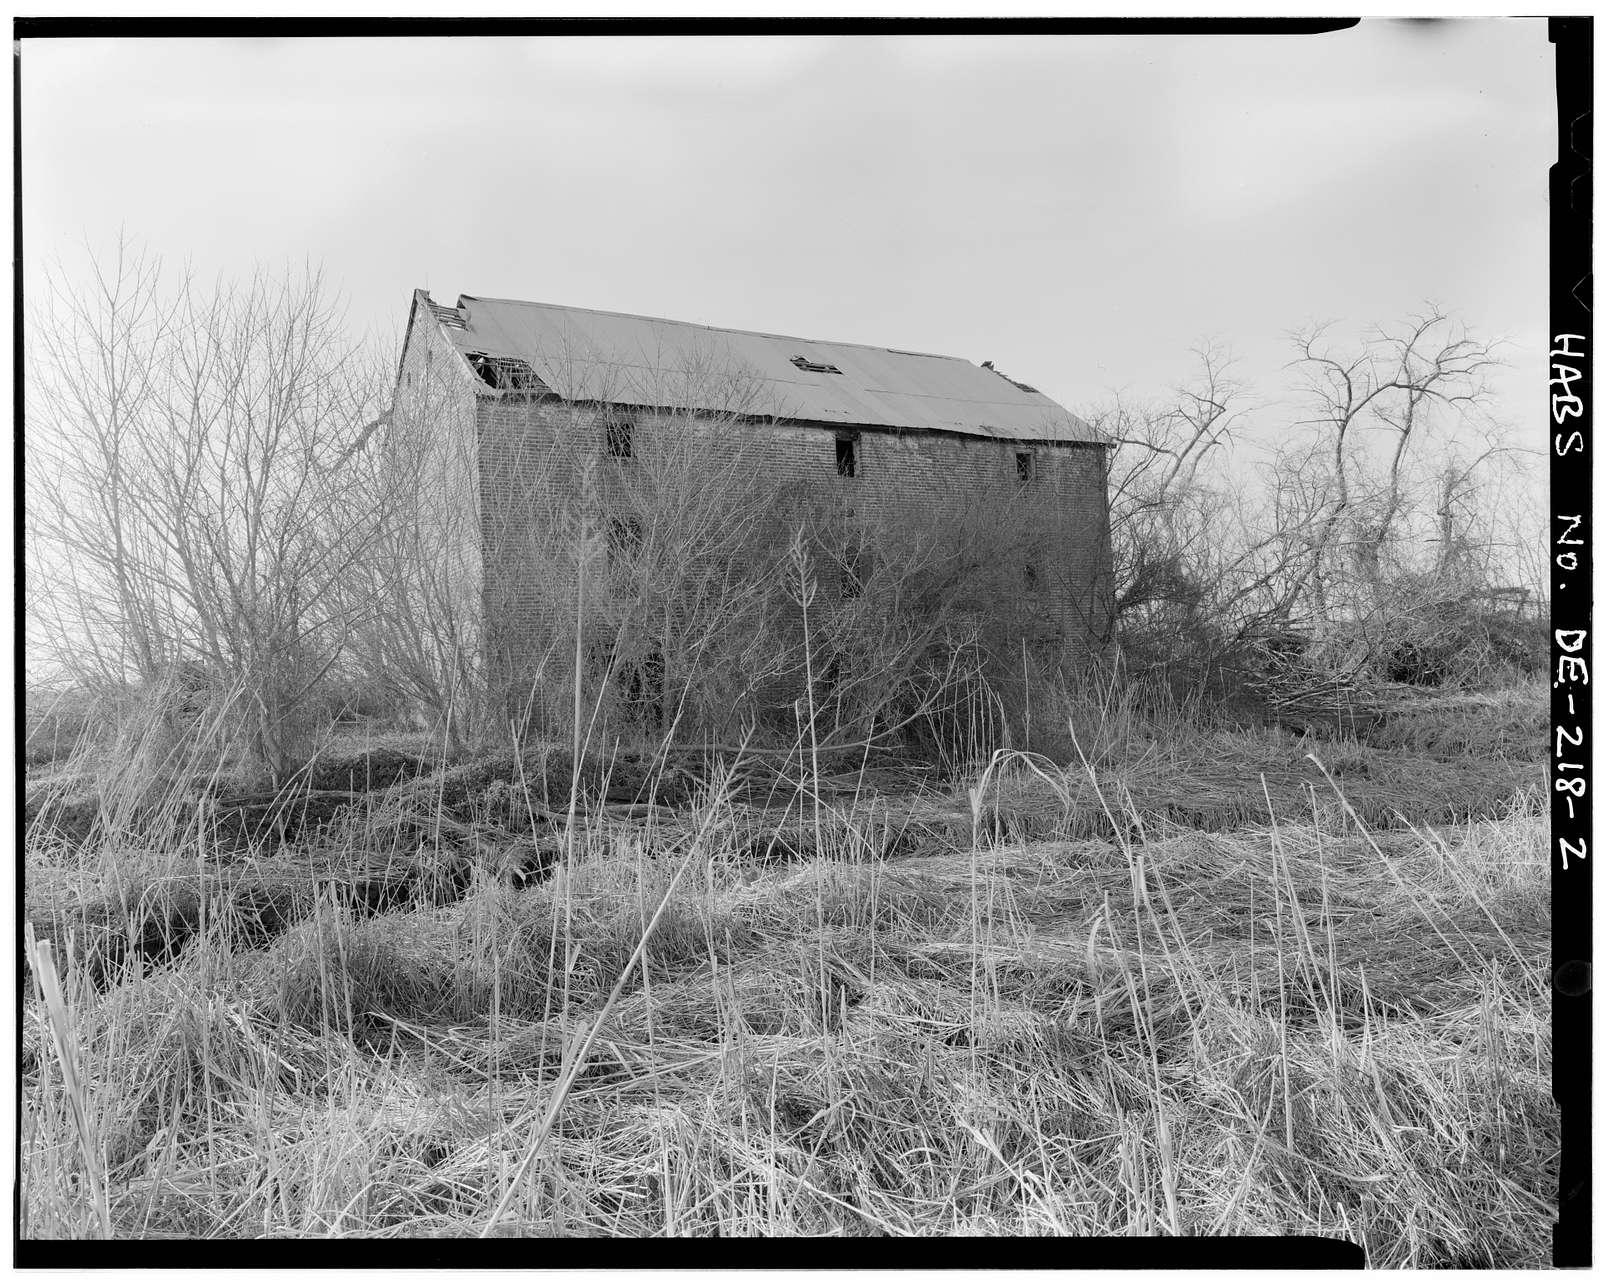 Brick Store, Route 488, East of Road 489, Smyrna, Kent County, DE